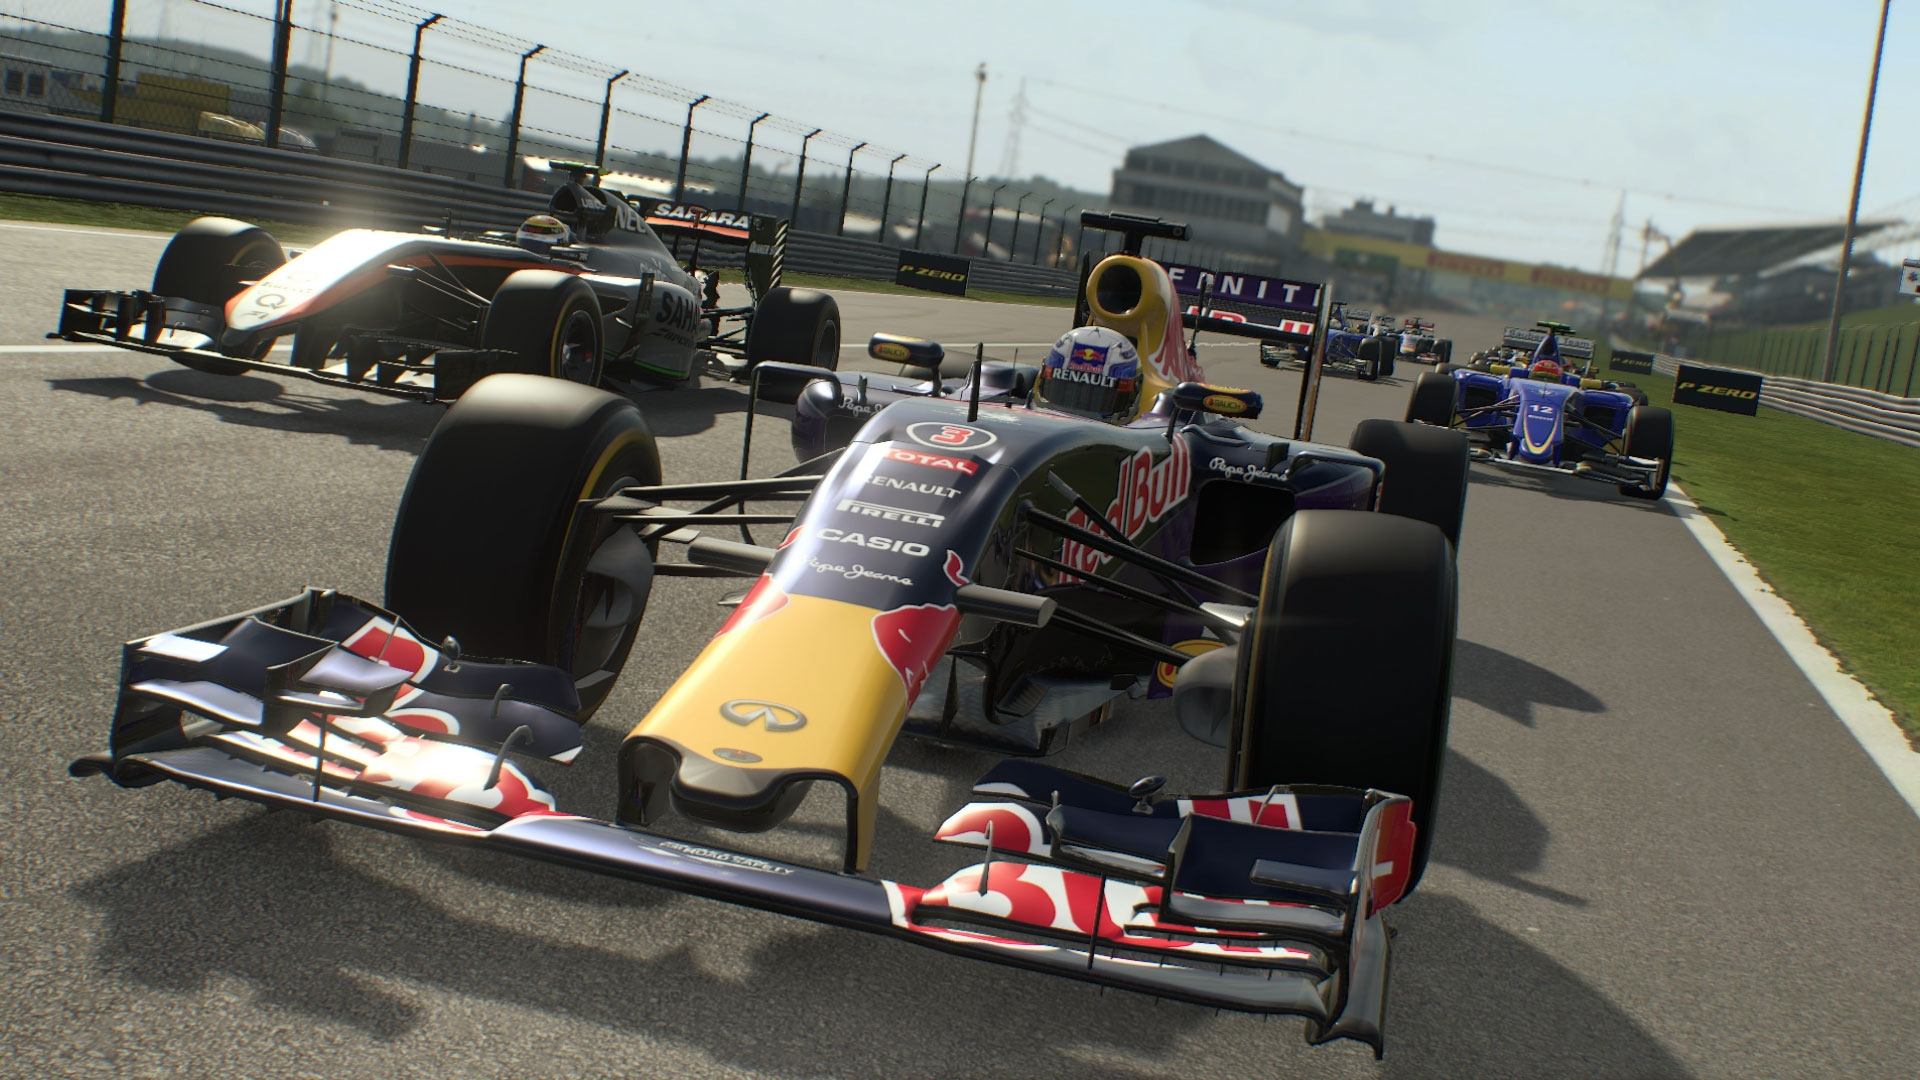 Codemasters_F1_2015_Silverstone_1